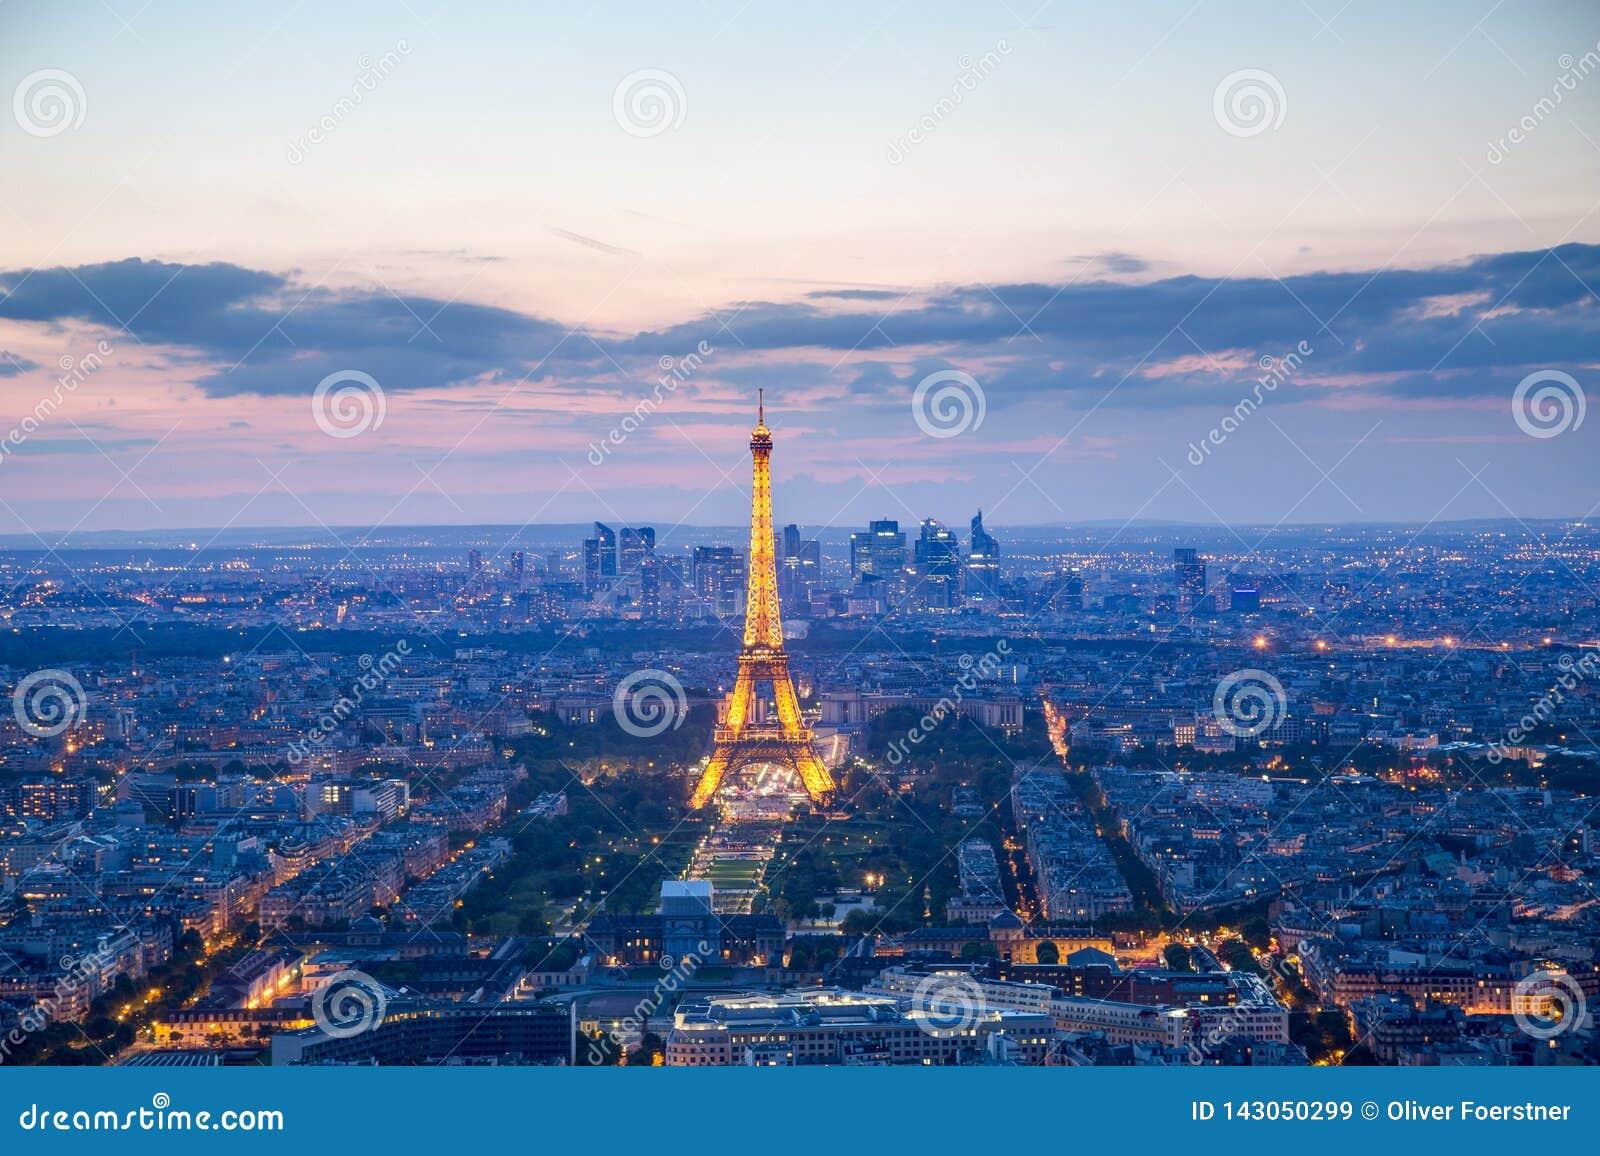 Torre Eiffel illuminata a Parigi alla notte